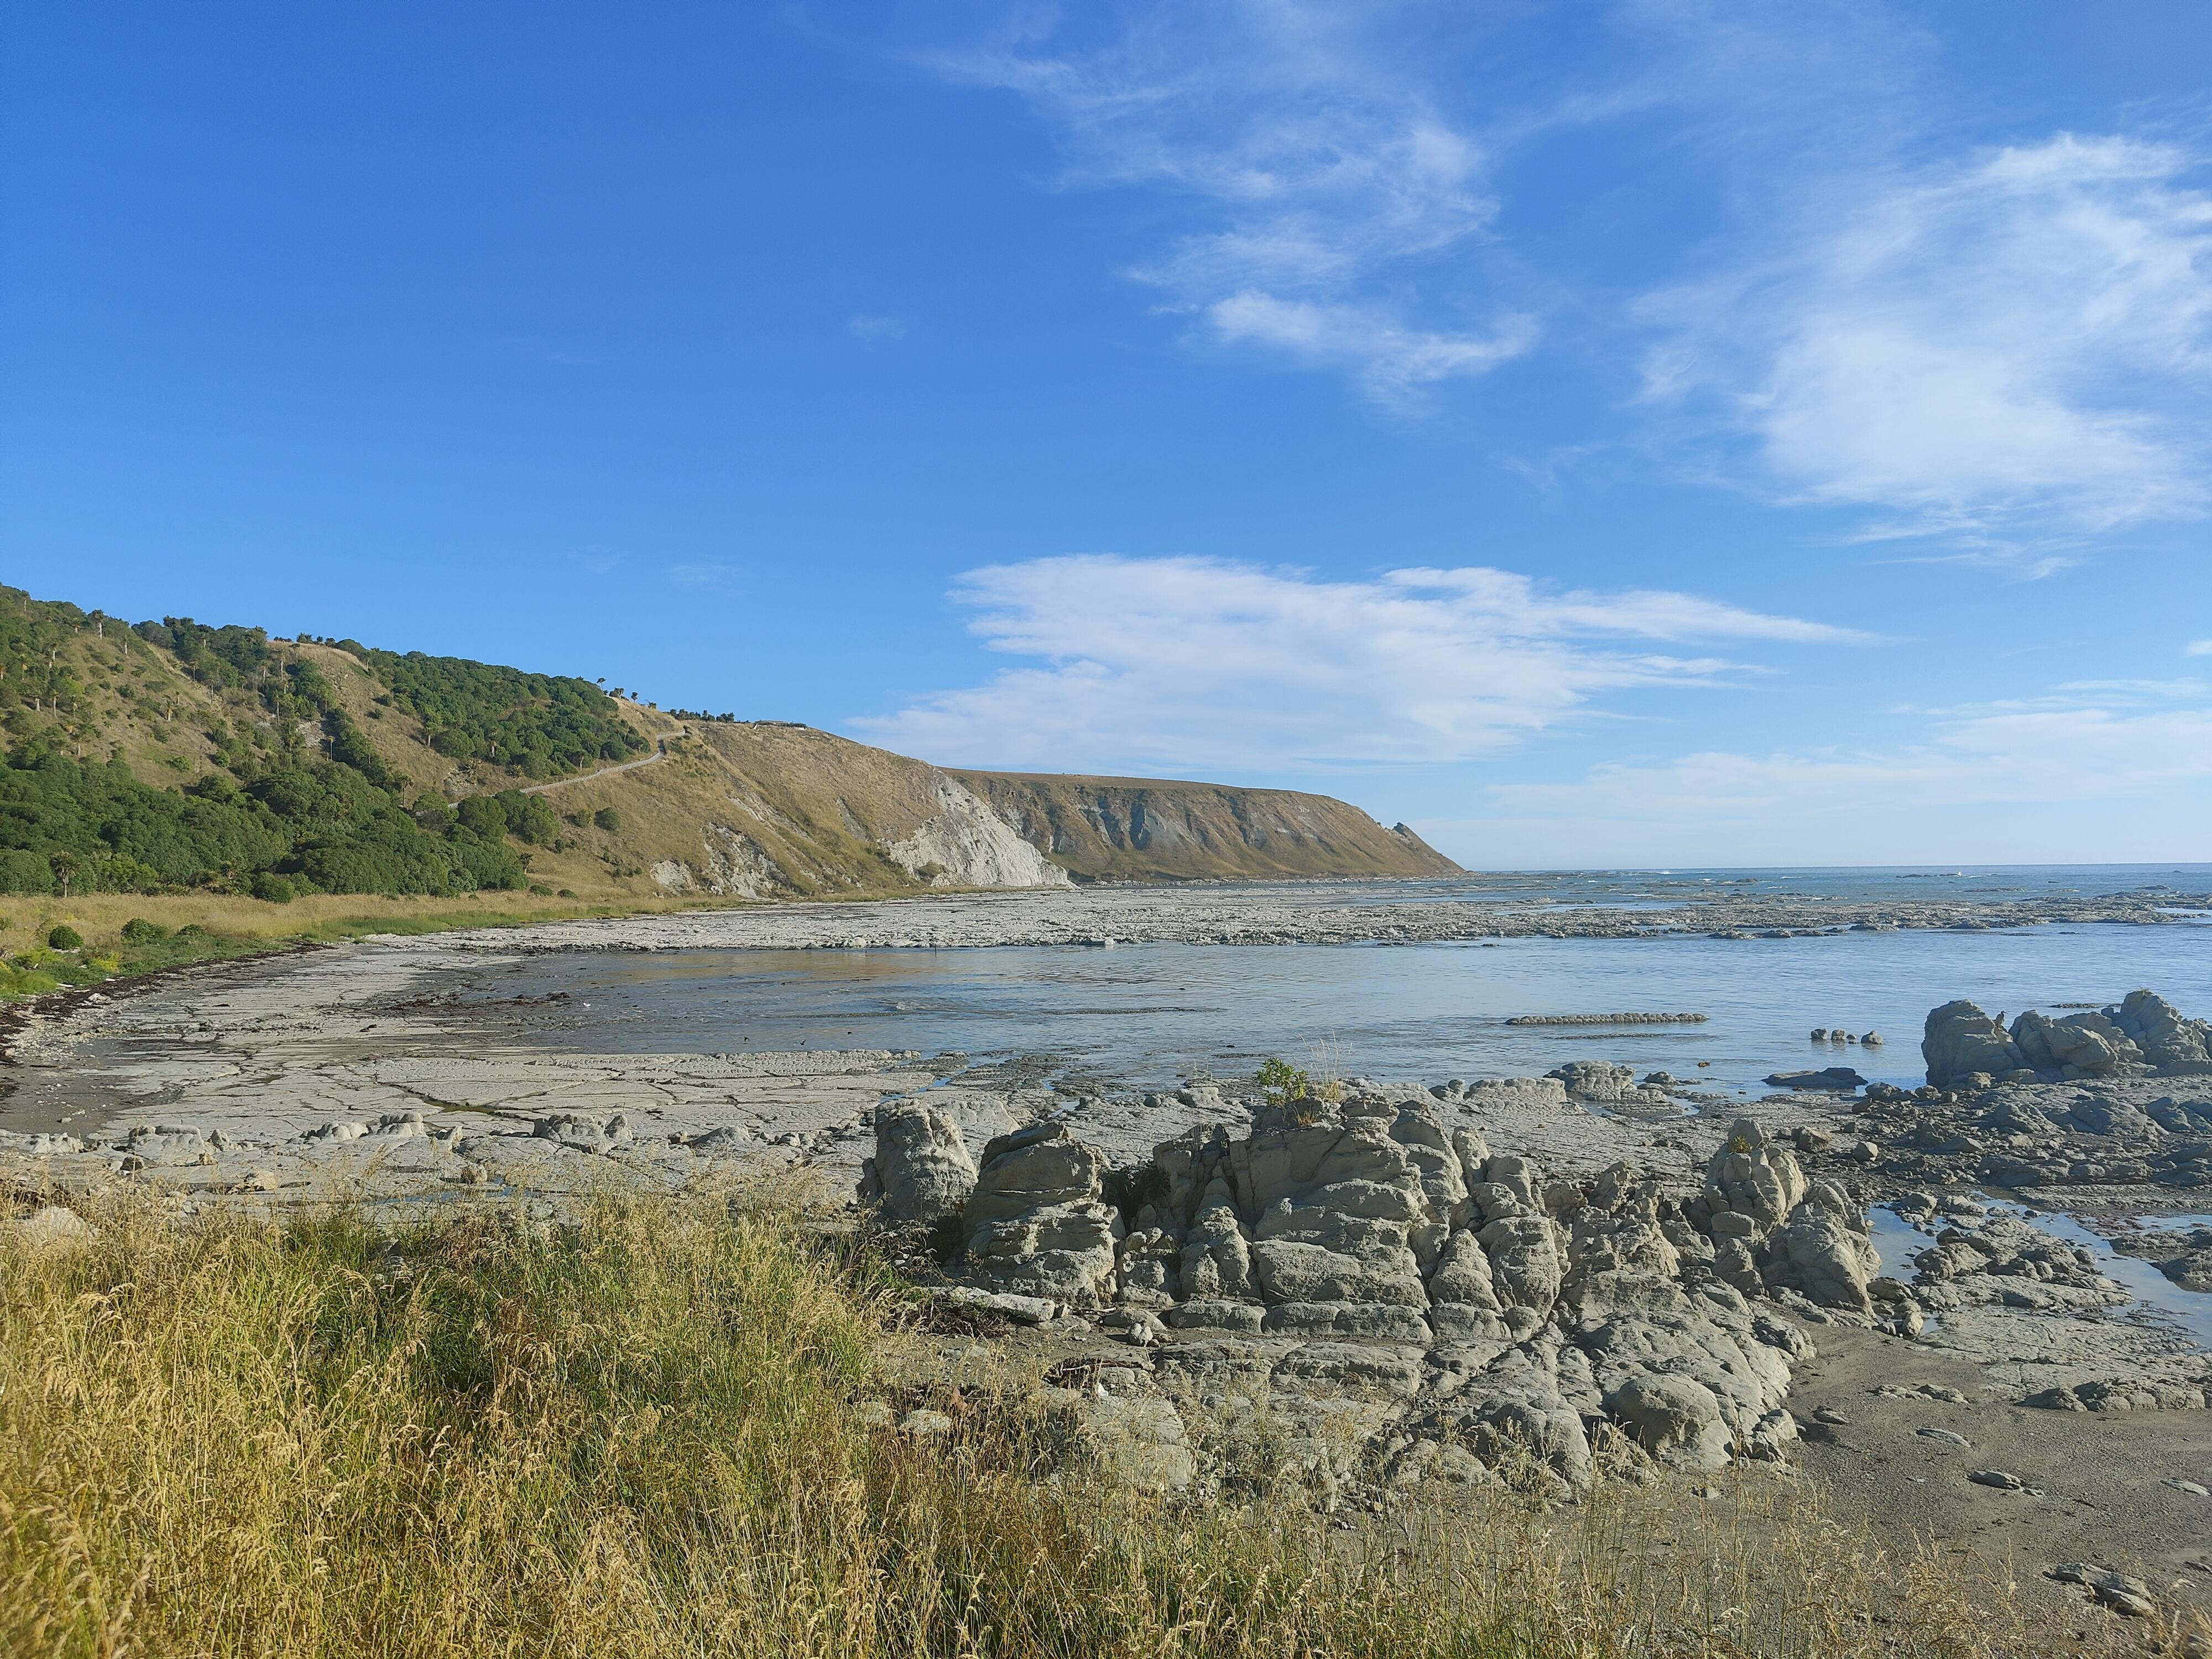 One of the last bays on the Kaikoura Peninsula Walkway